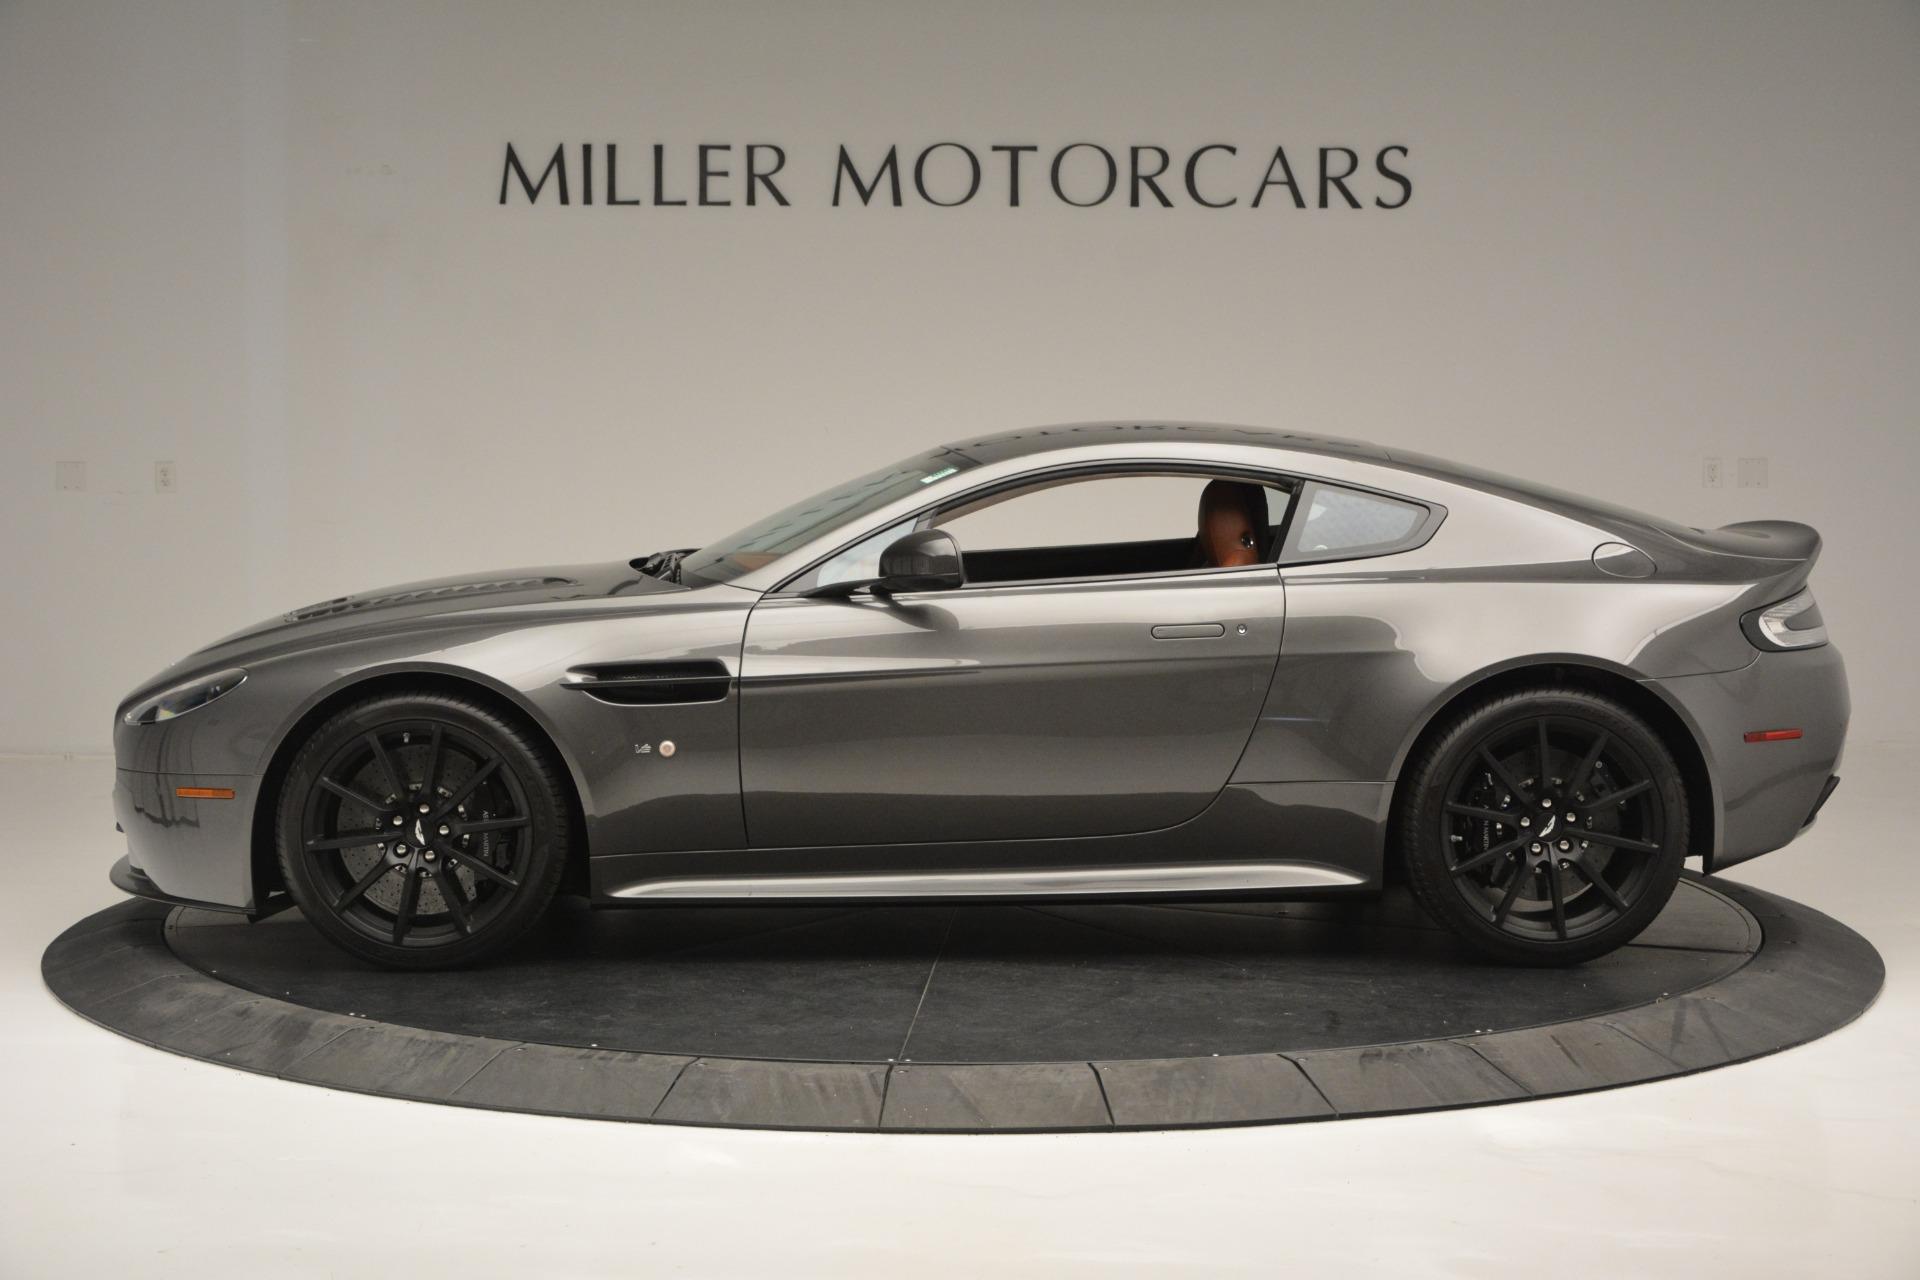 Used 2017 Aston Martin V12 Vantage S  For Sale In Greenwich, CT. Alfa Romeo of Greenwich, 7429 2561_p3